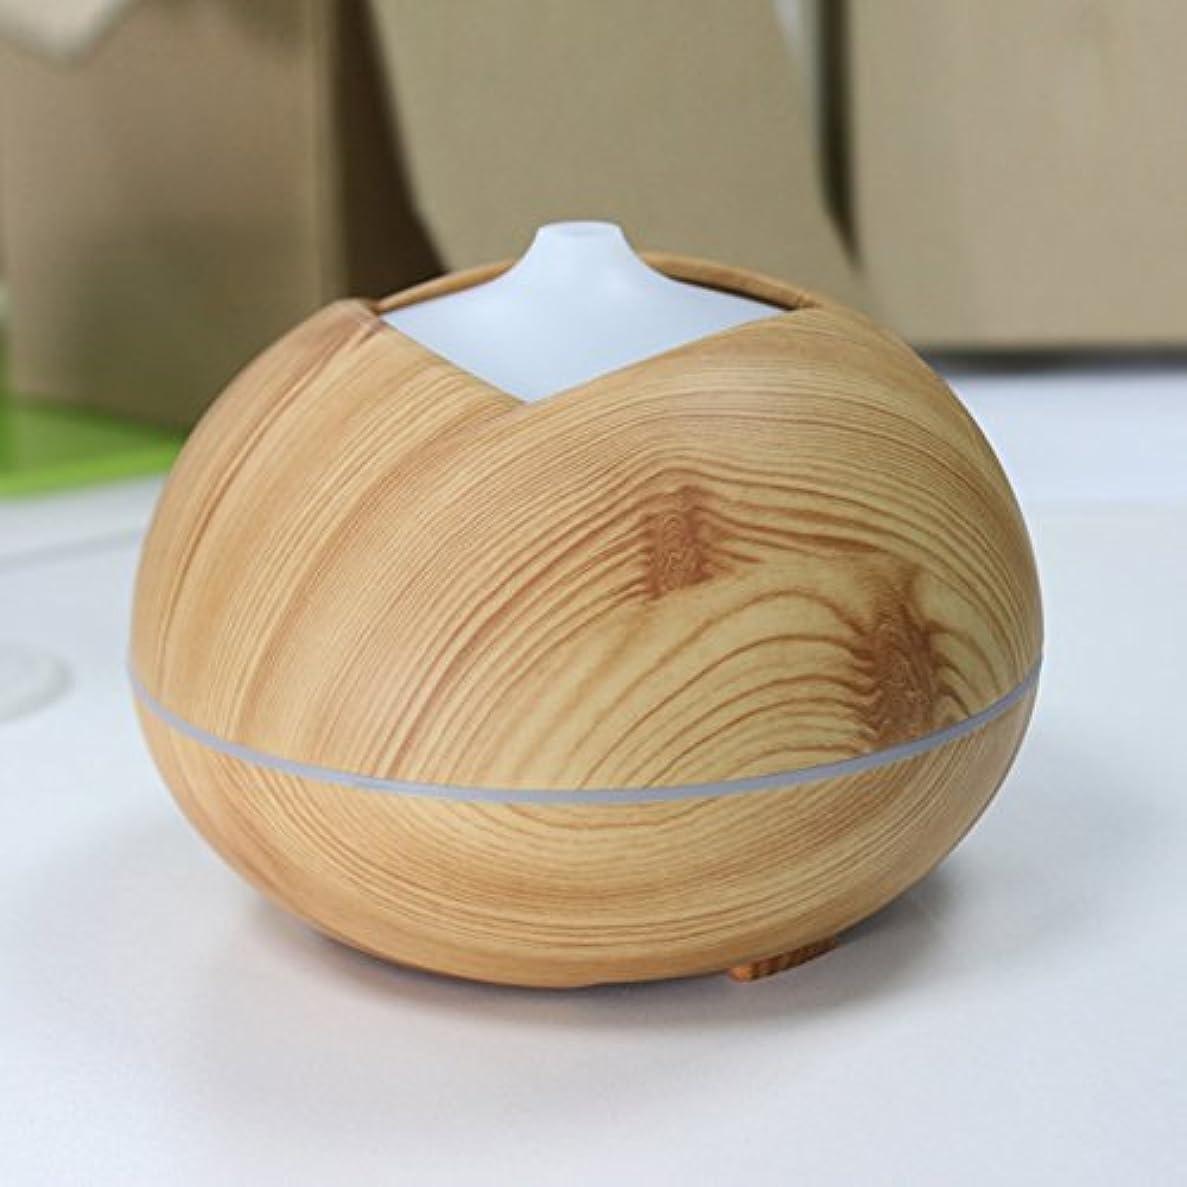 Yiding加湿器木製カラーCool Mist超音波アロマEssential Oil Diffuser for Officeホームベッドルーム